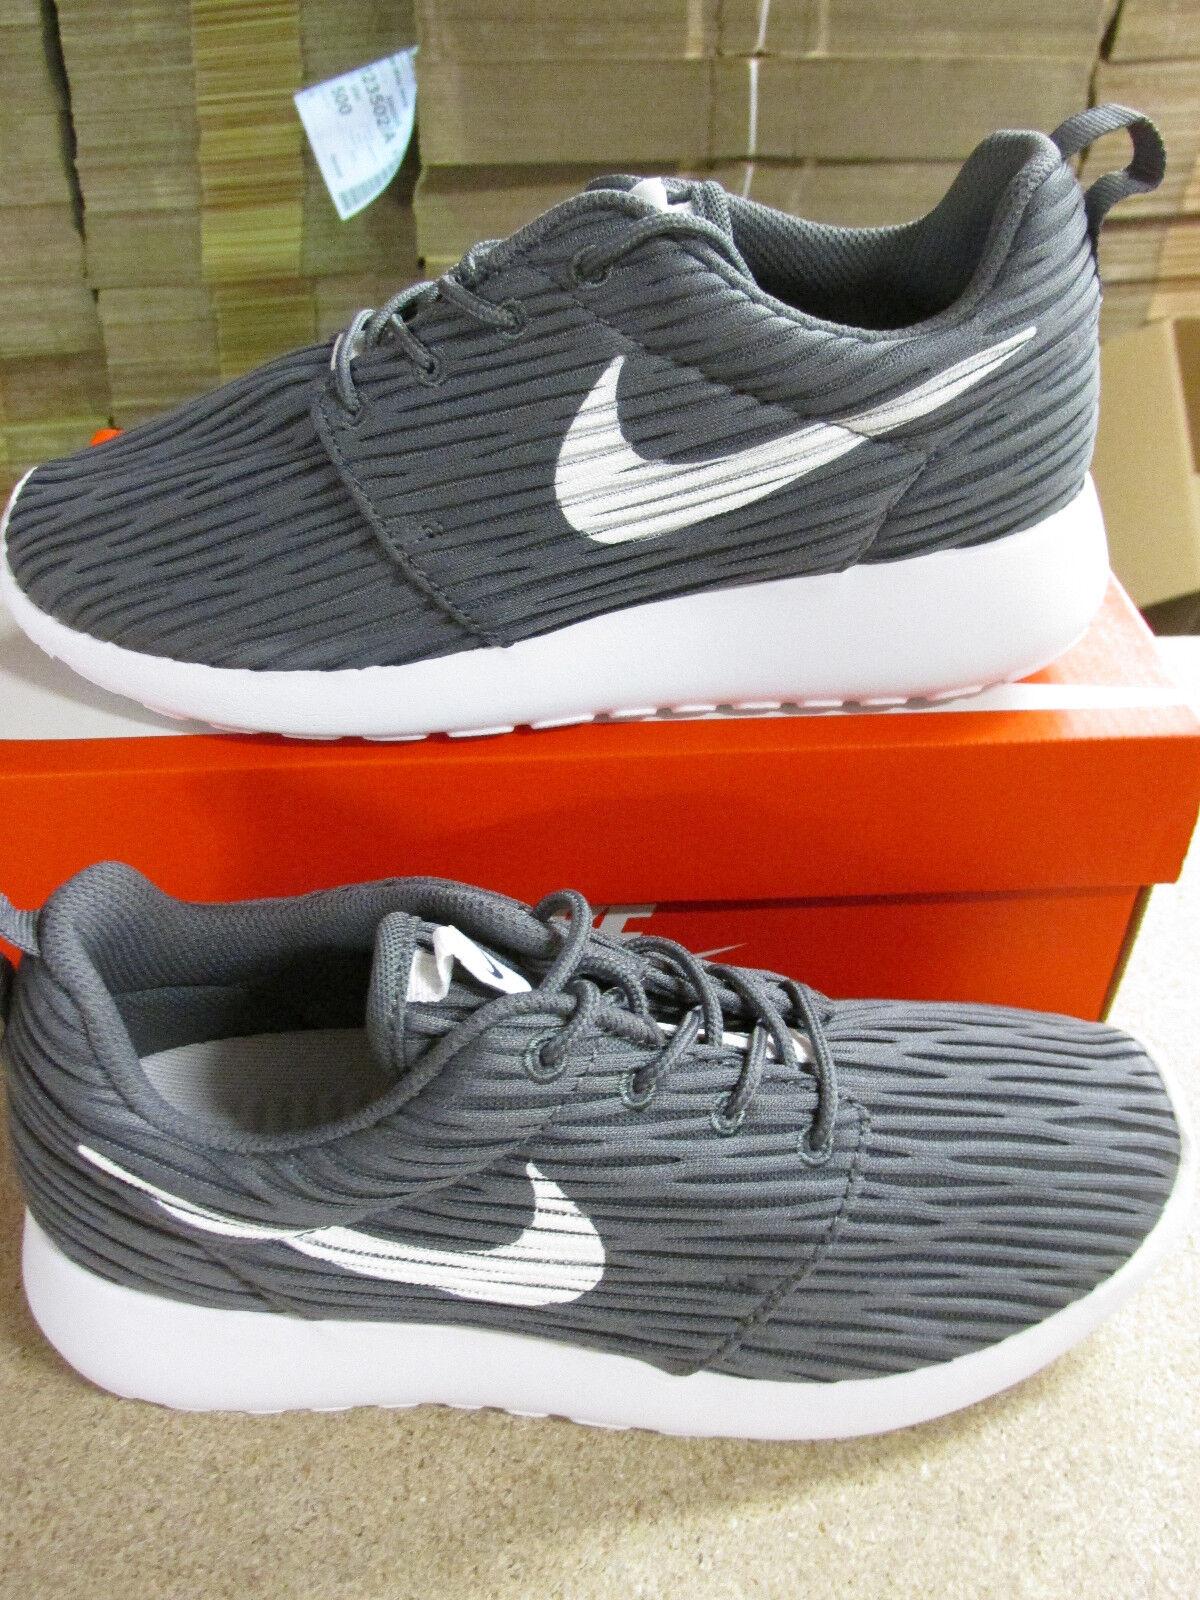 Nike) roshe correndo una eng zapatillas correndo roshe 833818 011 zapatillas e2c153